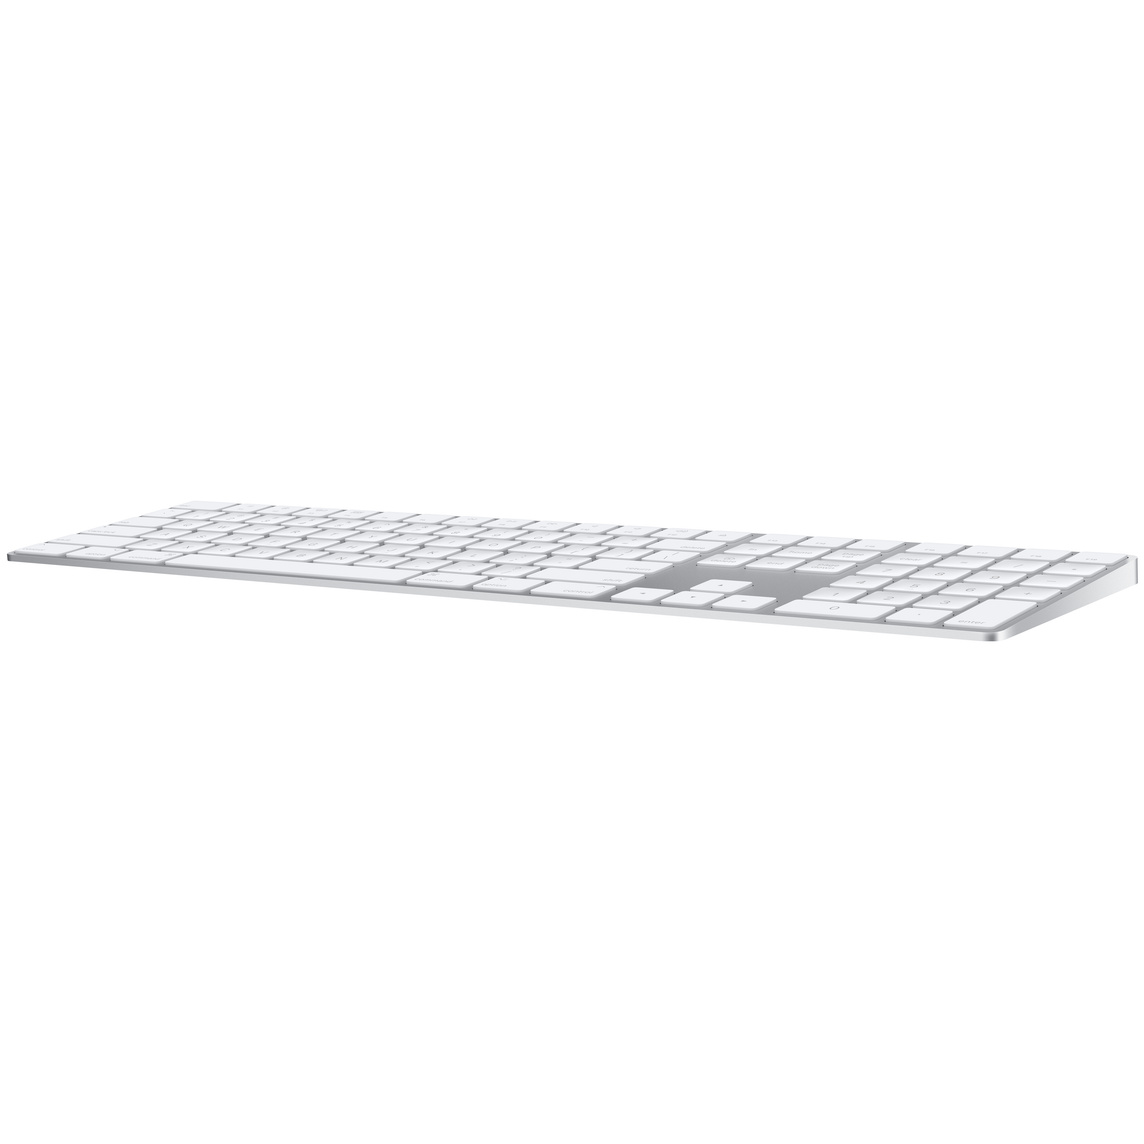 Italiano Argento Apple Magic Keyboard con tastierino numerico